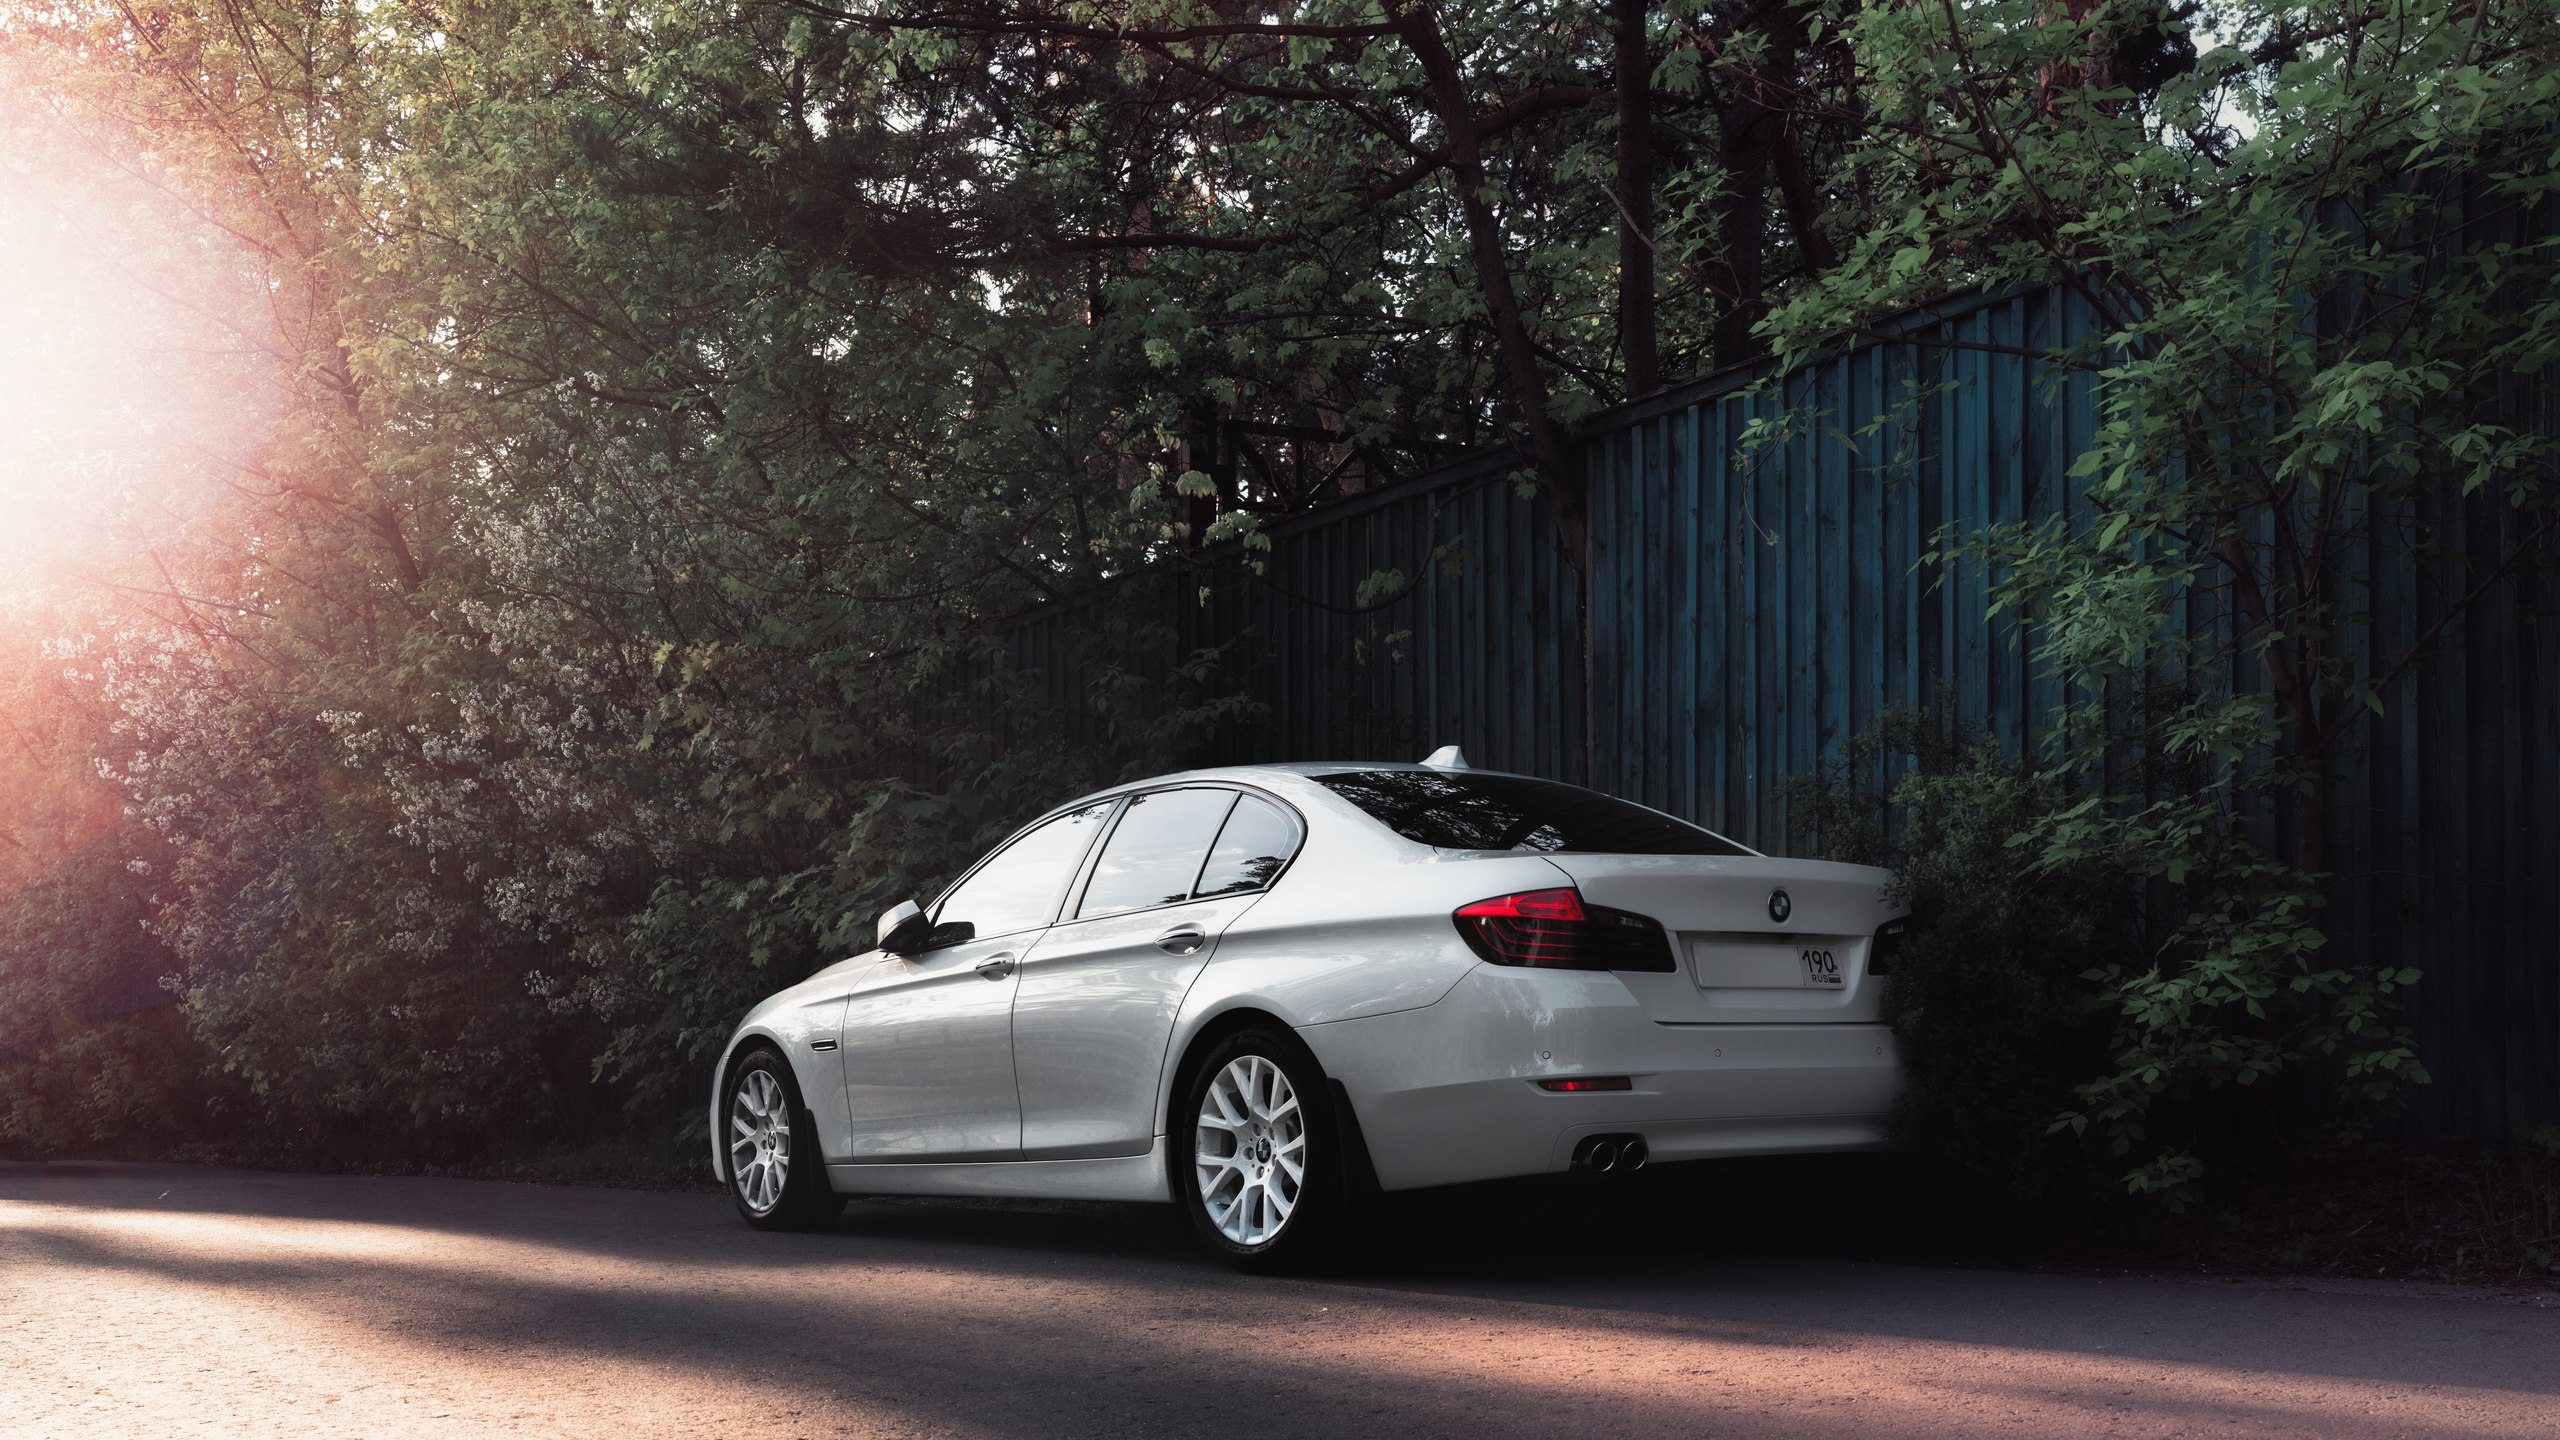 BMW HD Wallpaper | Background Image | 2560x1440 | ID ...